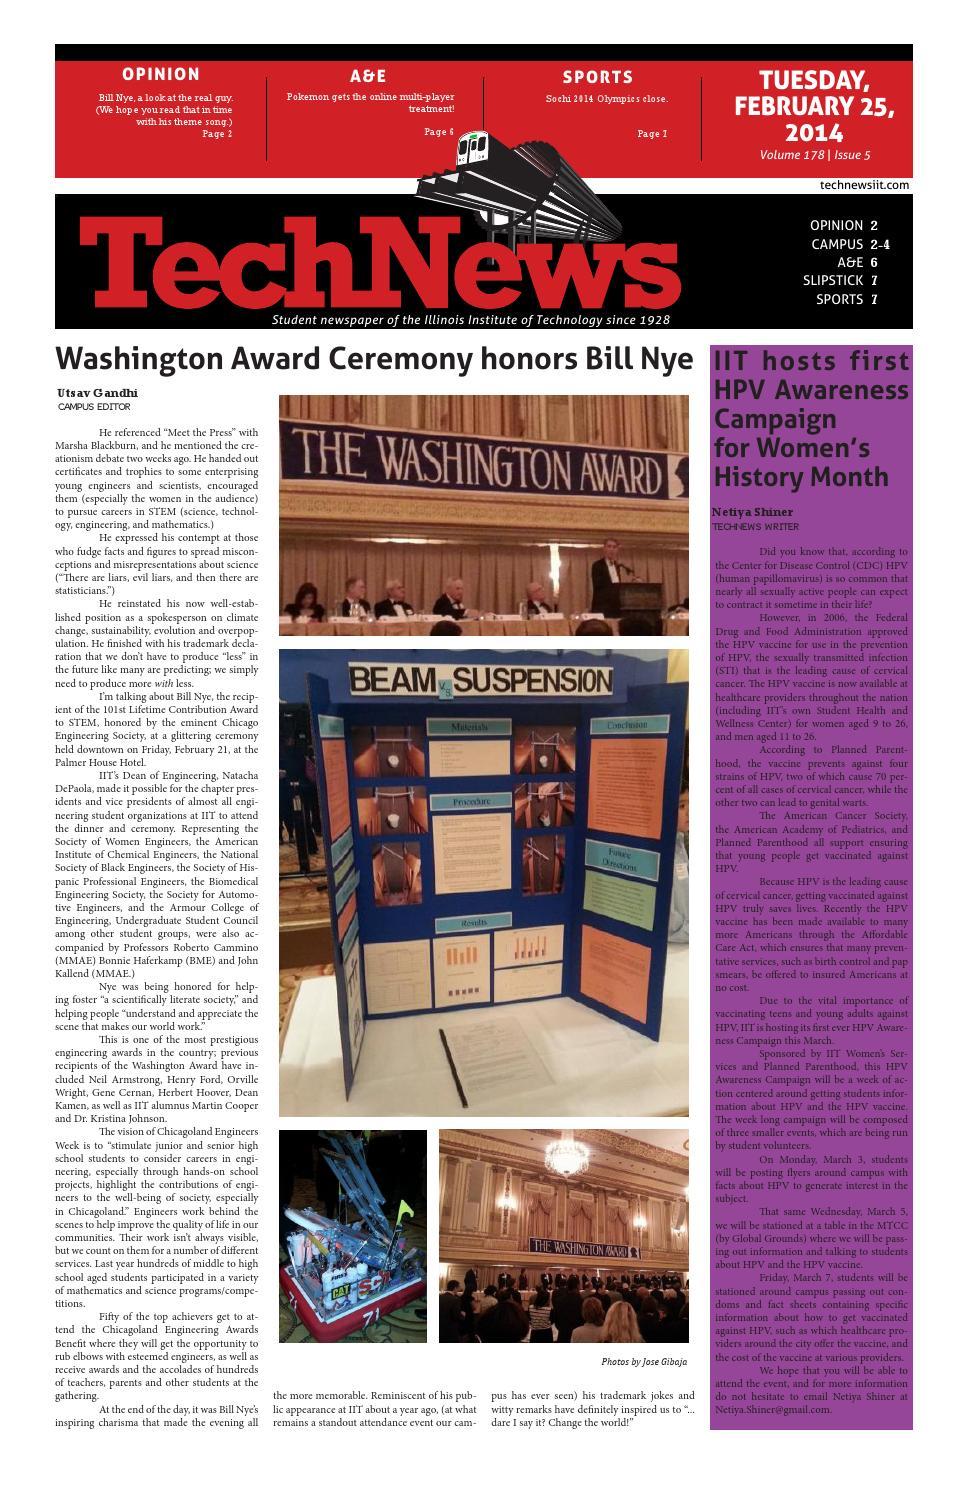 Volume 178, Issue 5 by TechNews - issuu